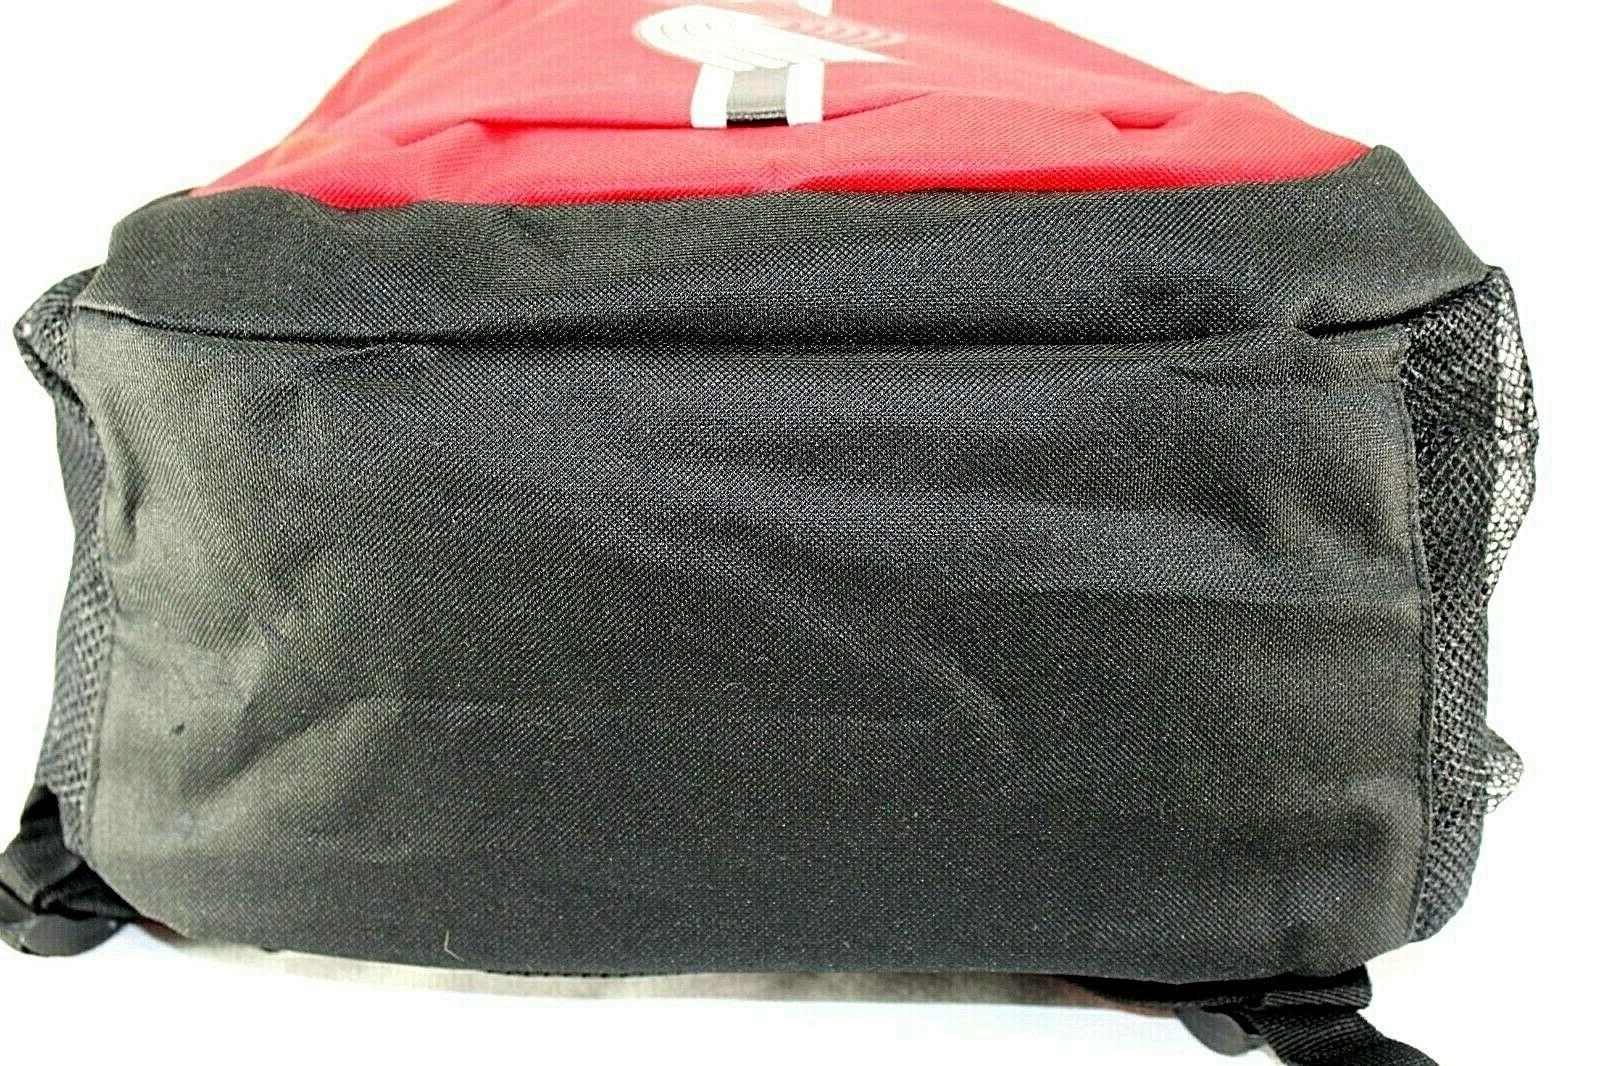 Portland Blazers NBA Backpack